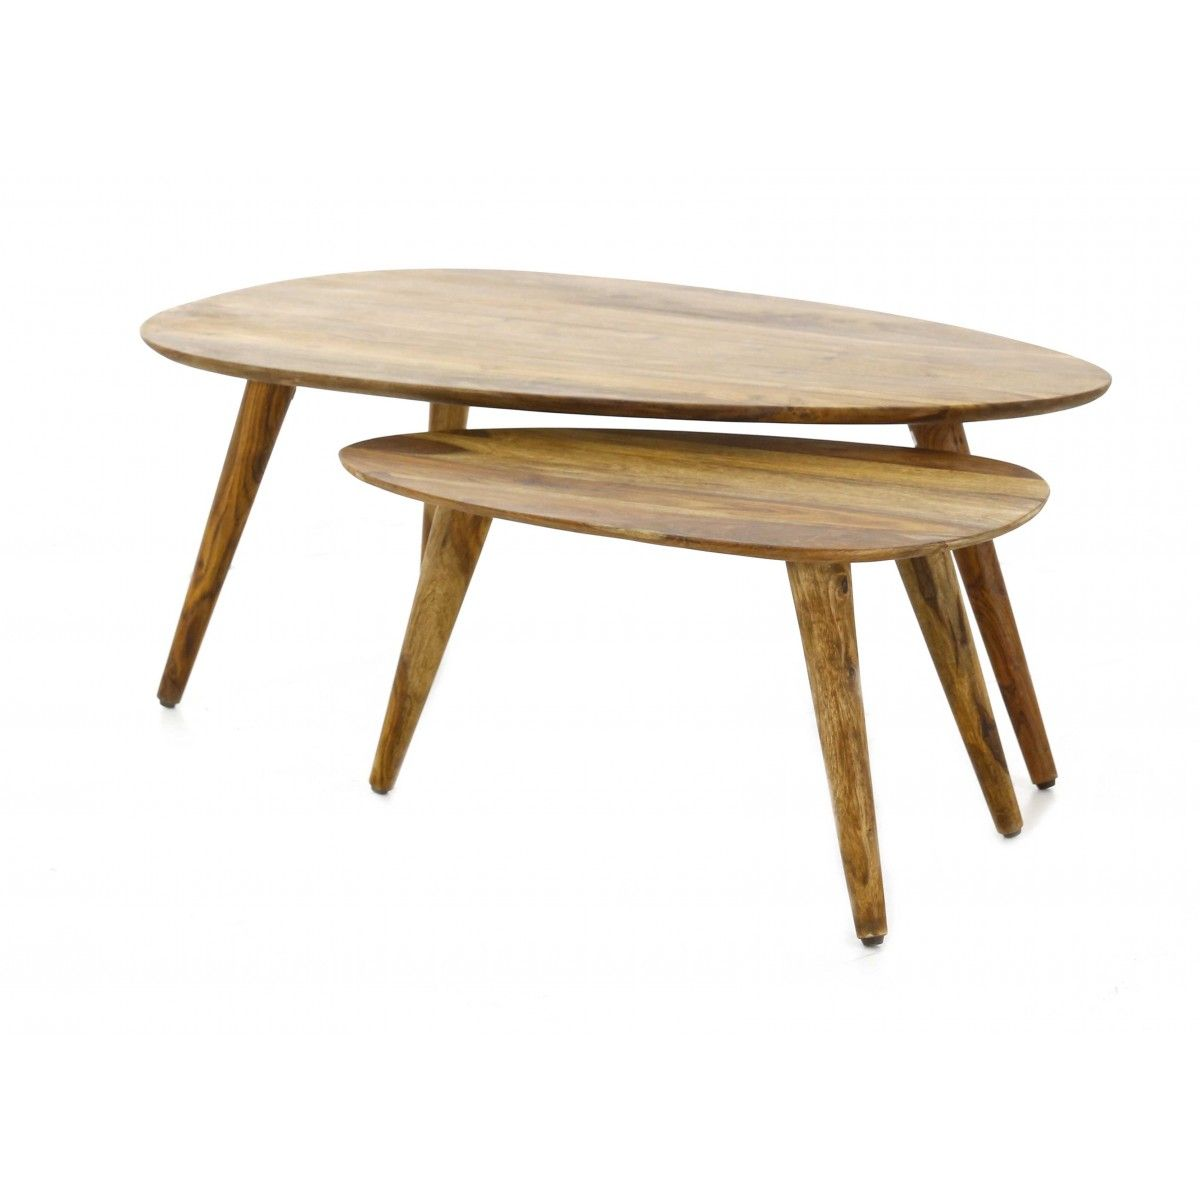 Tables gigognes en bois palissandre style vintage | Zago ...